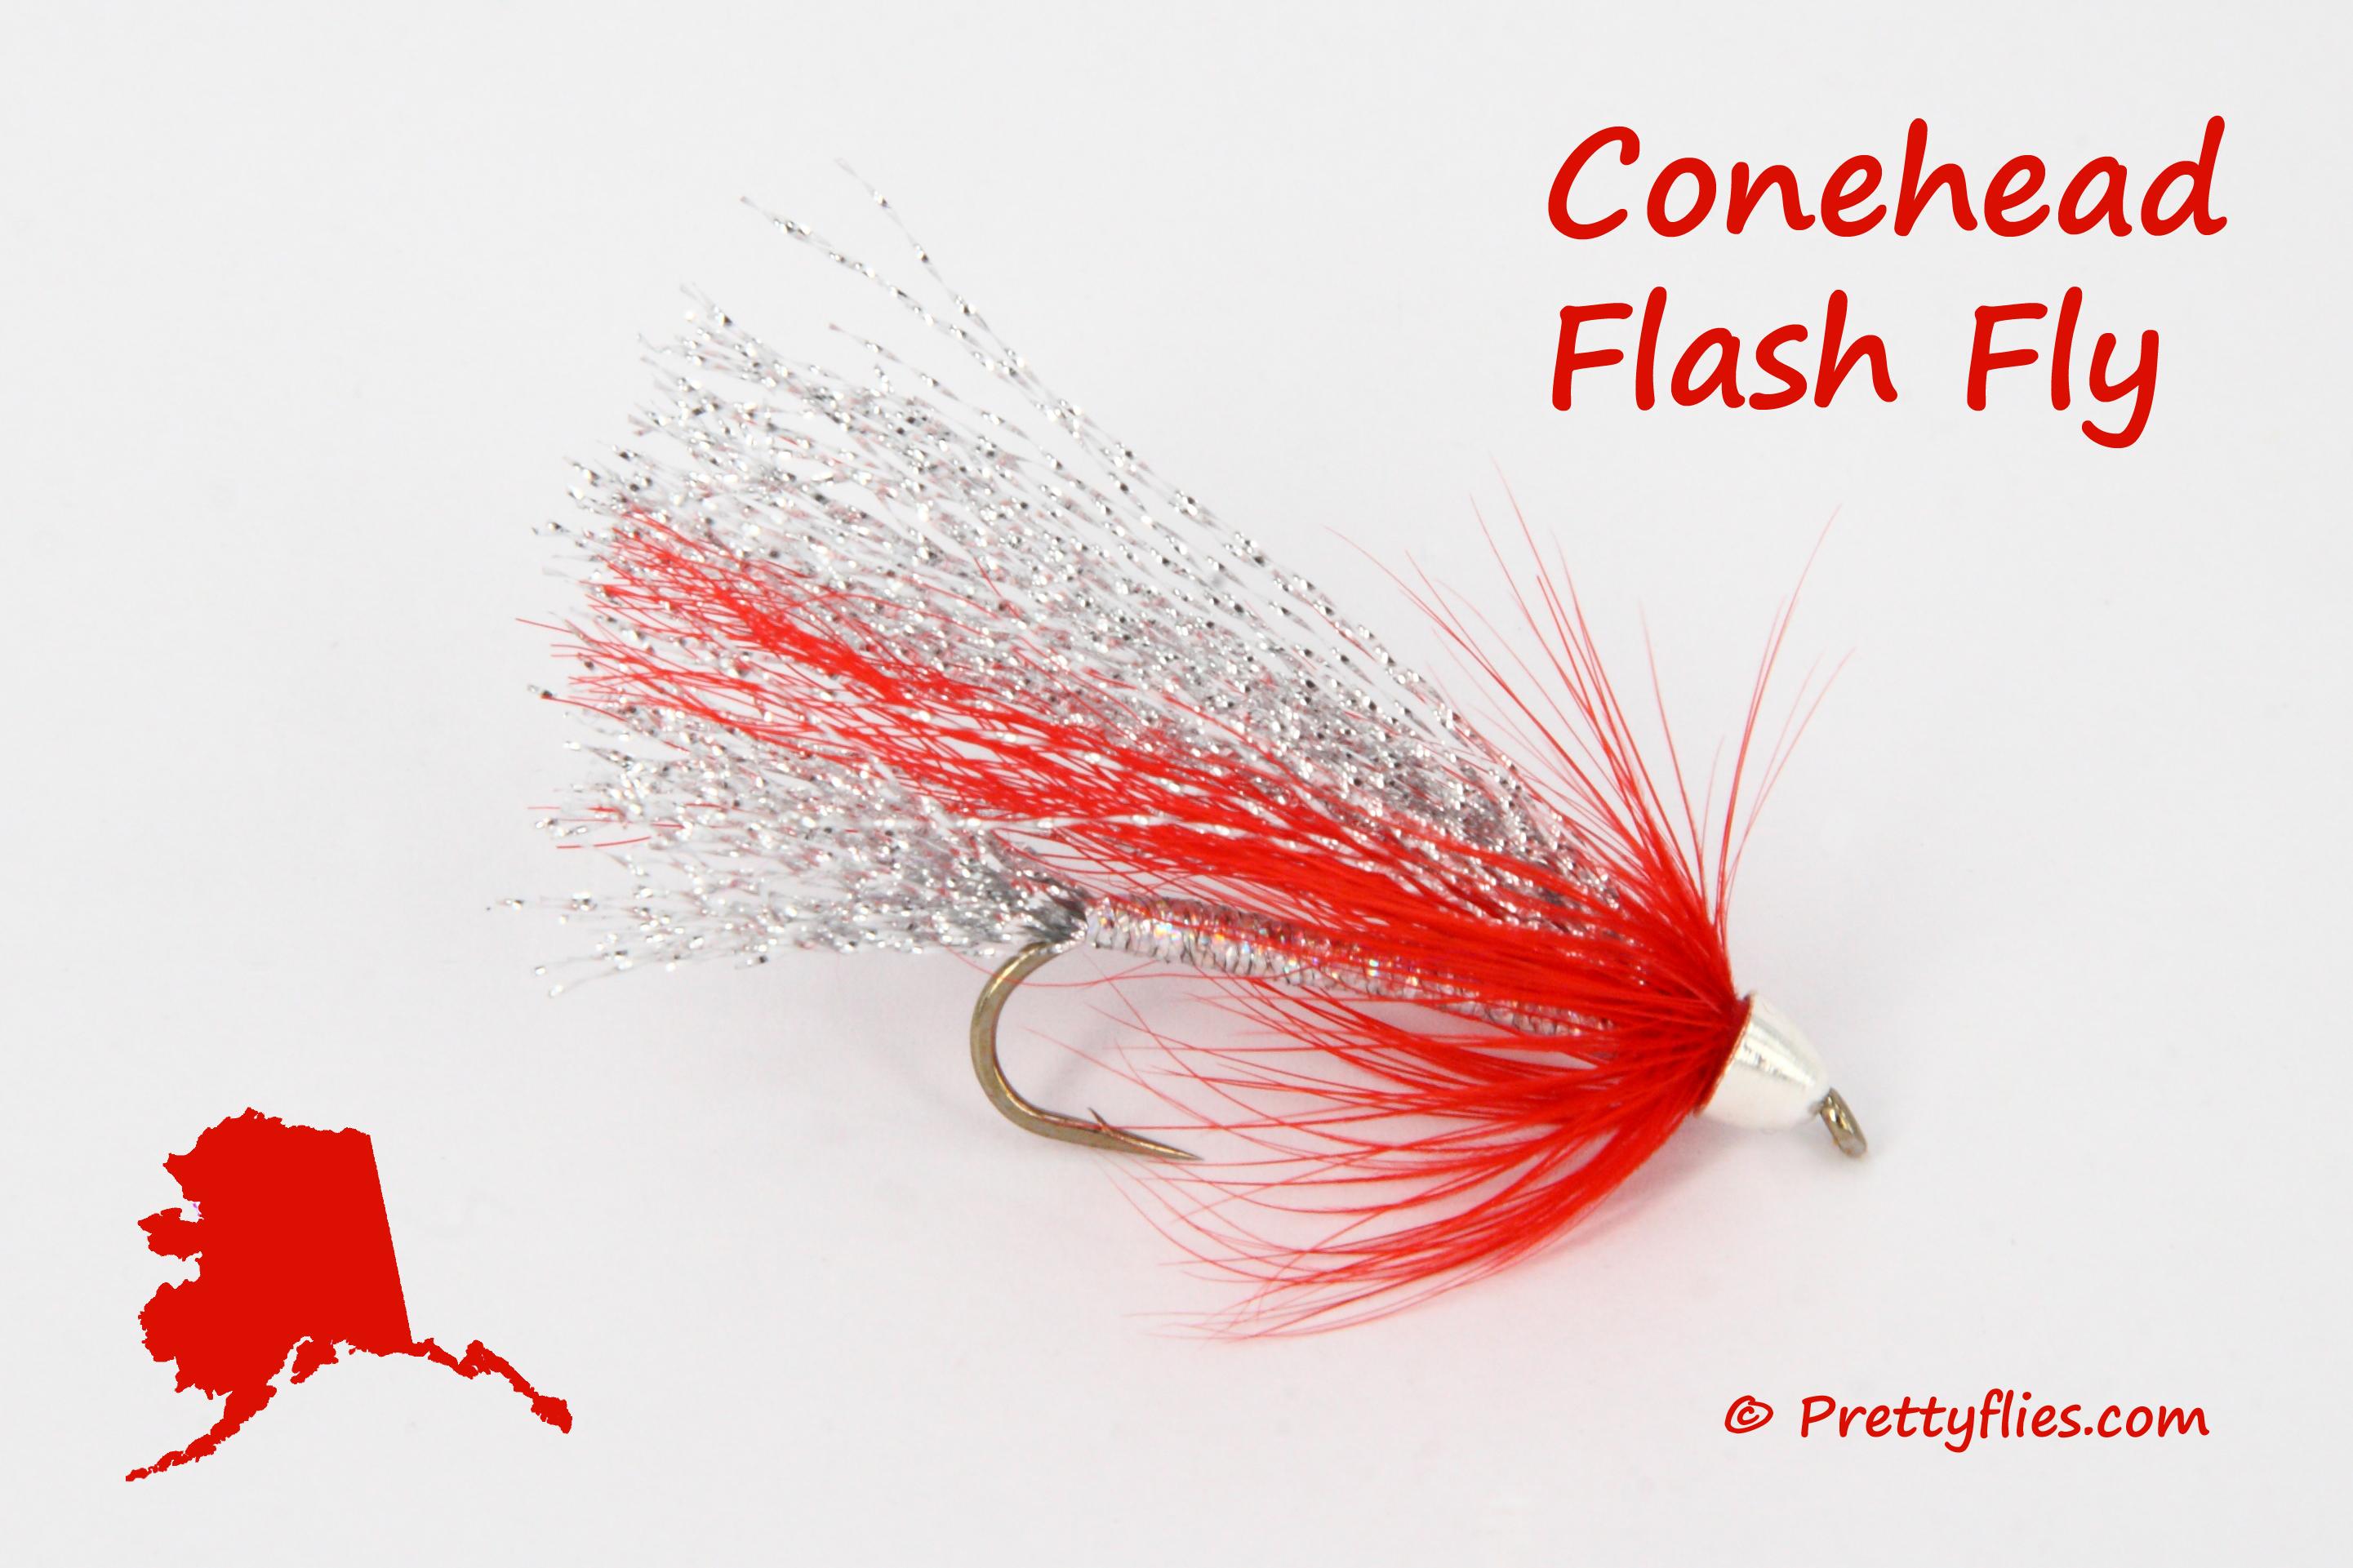 Conehead Flash Fly.jpg